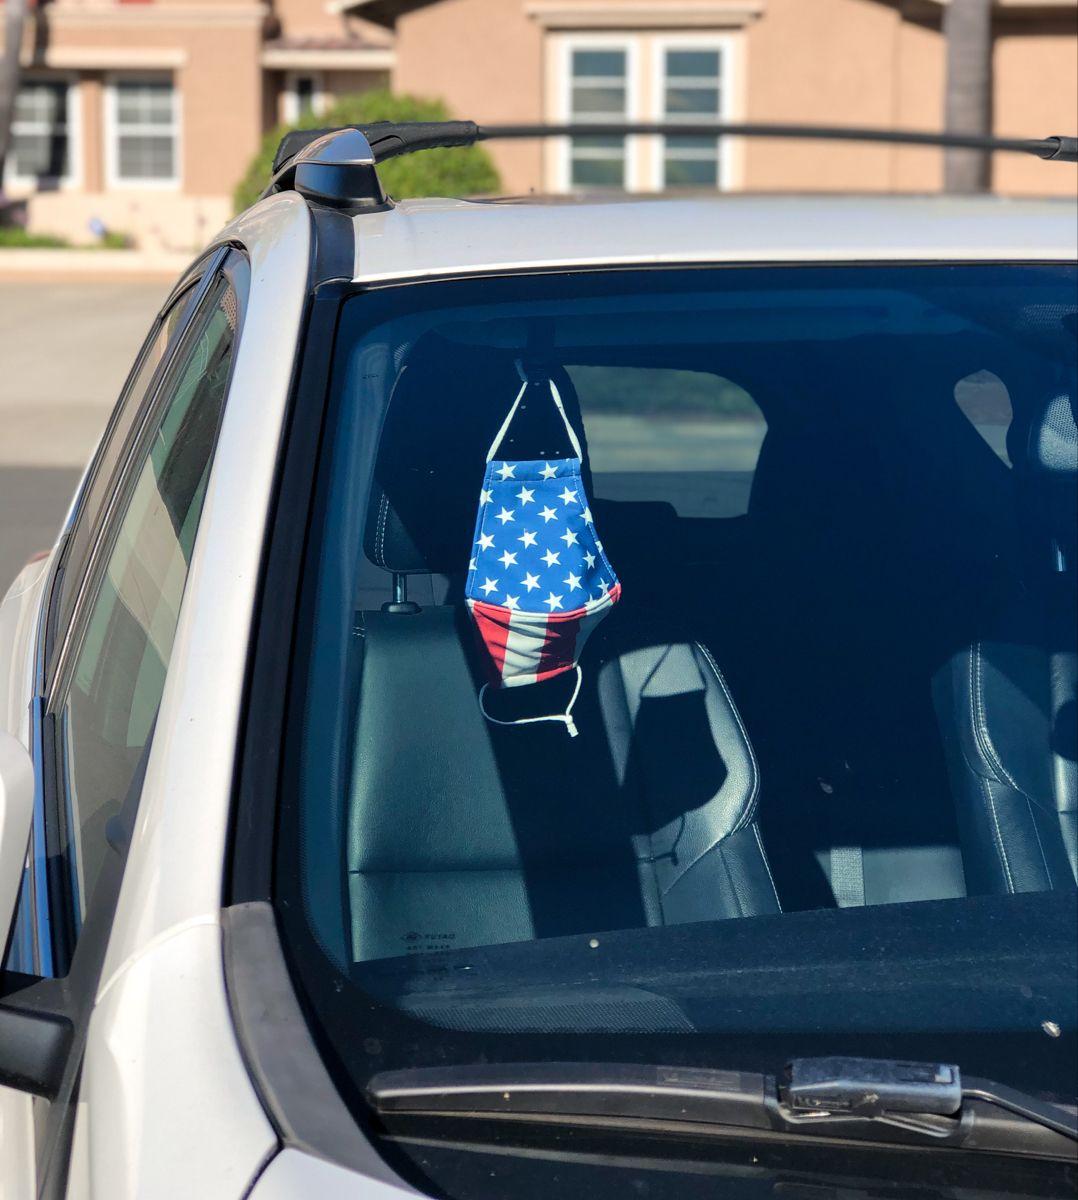 Universal Car Face Mask Holder, Window Visor Mount